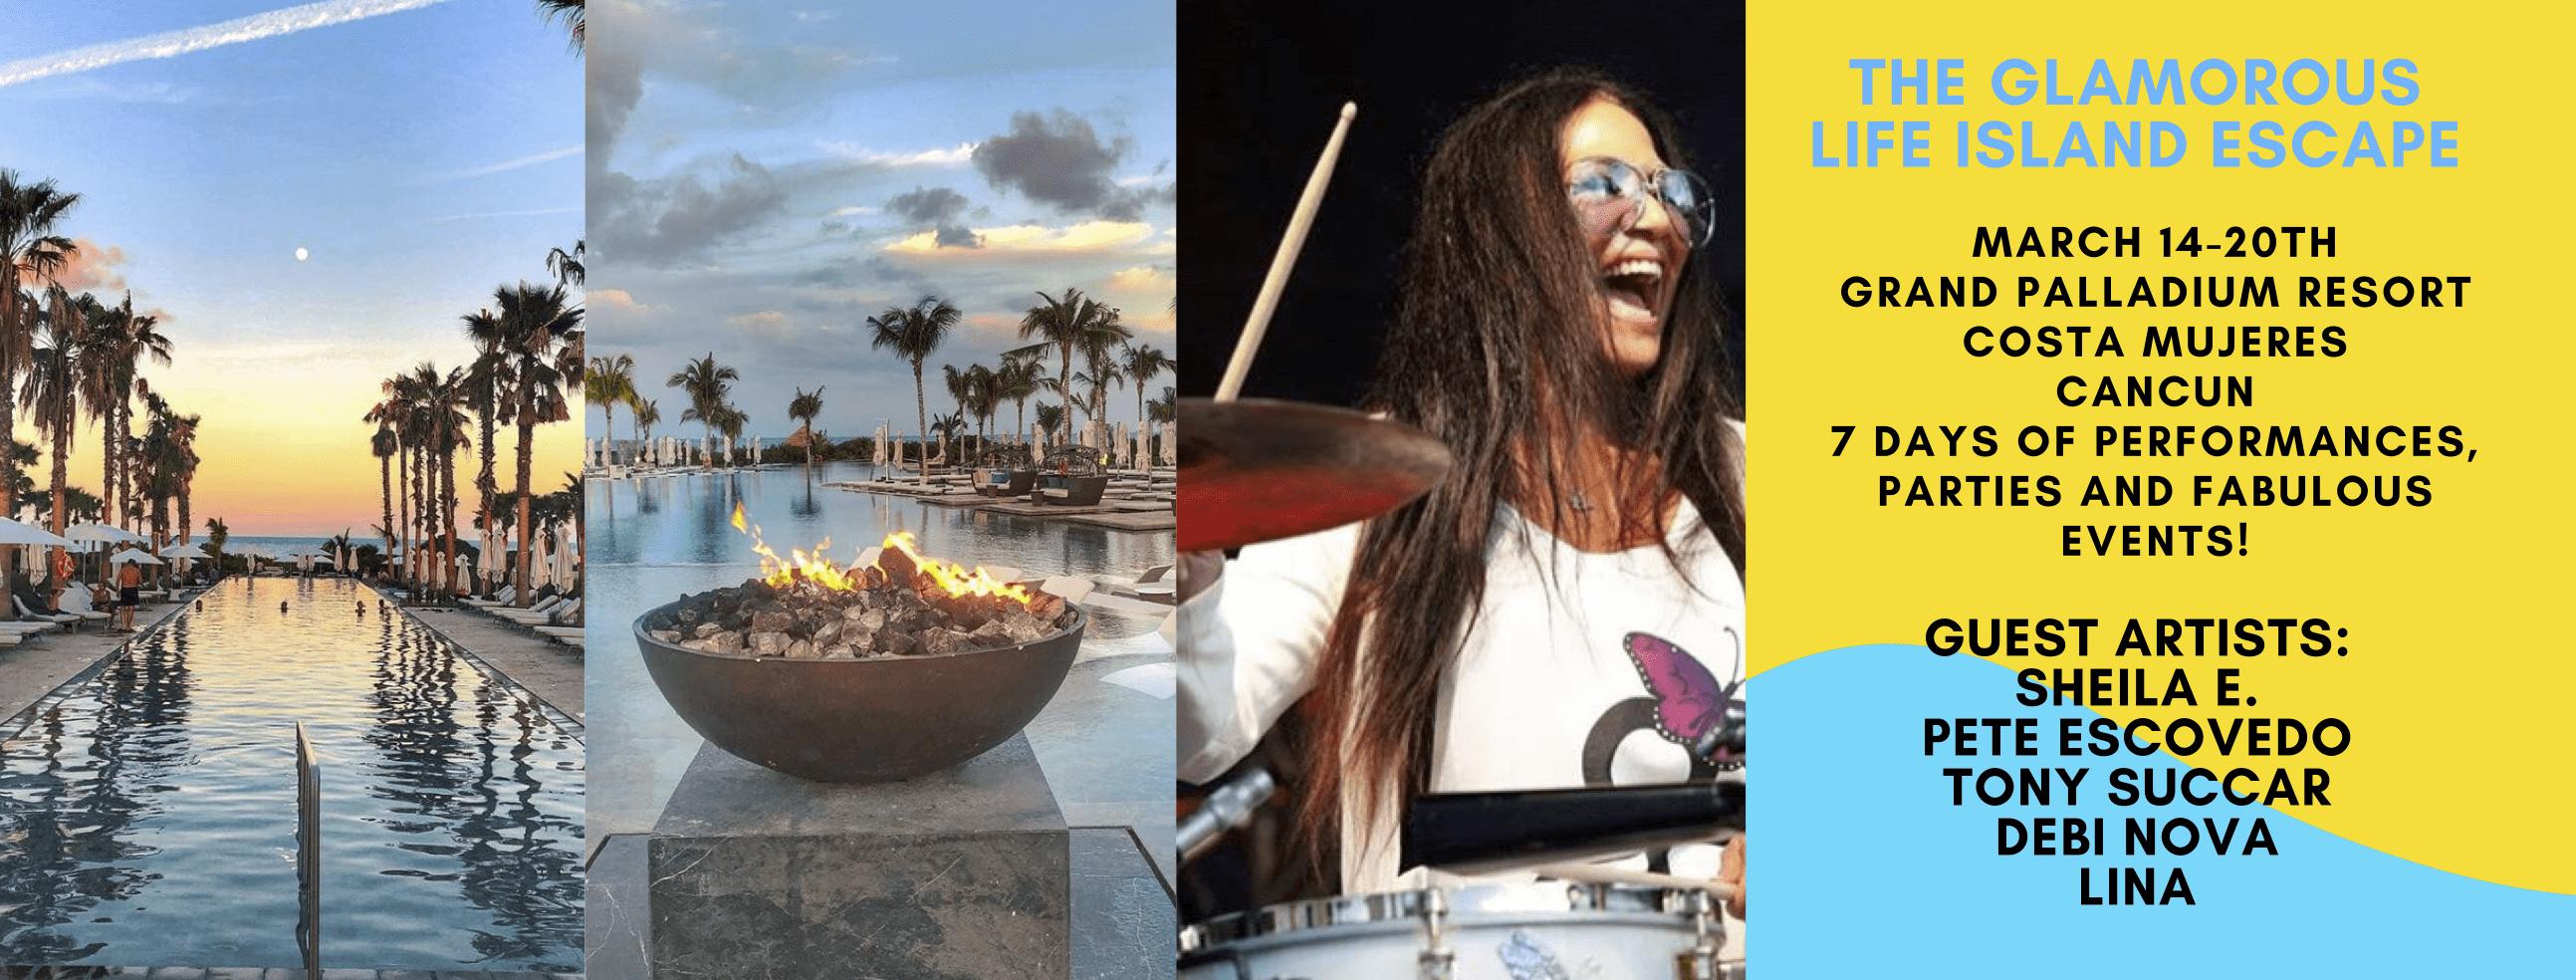 Sheila E. and Friends Glamorous Life Island Escape, March 14-20th, 2019